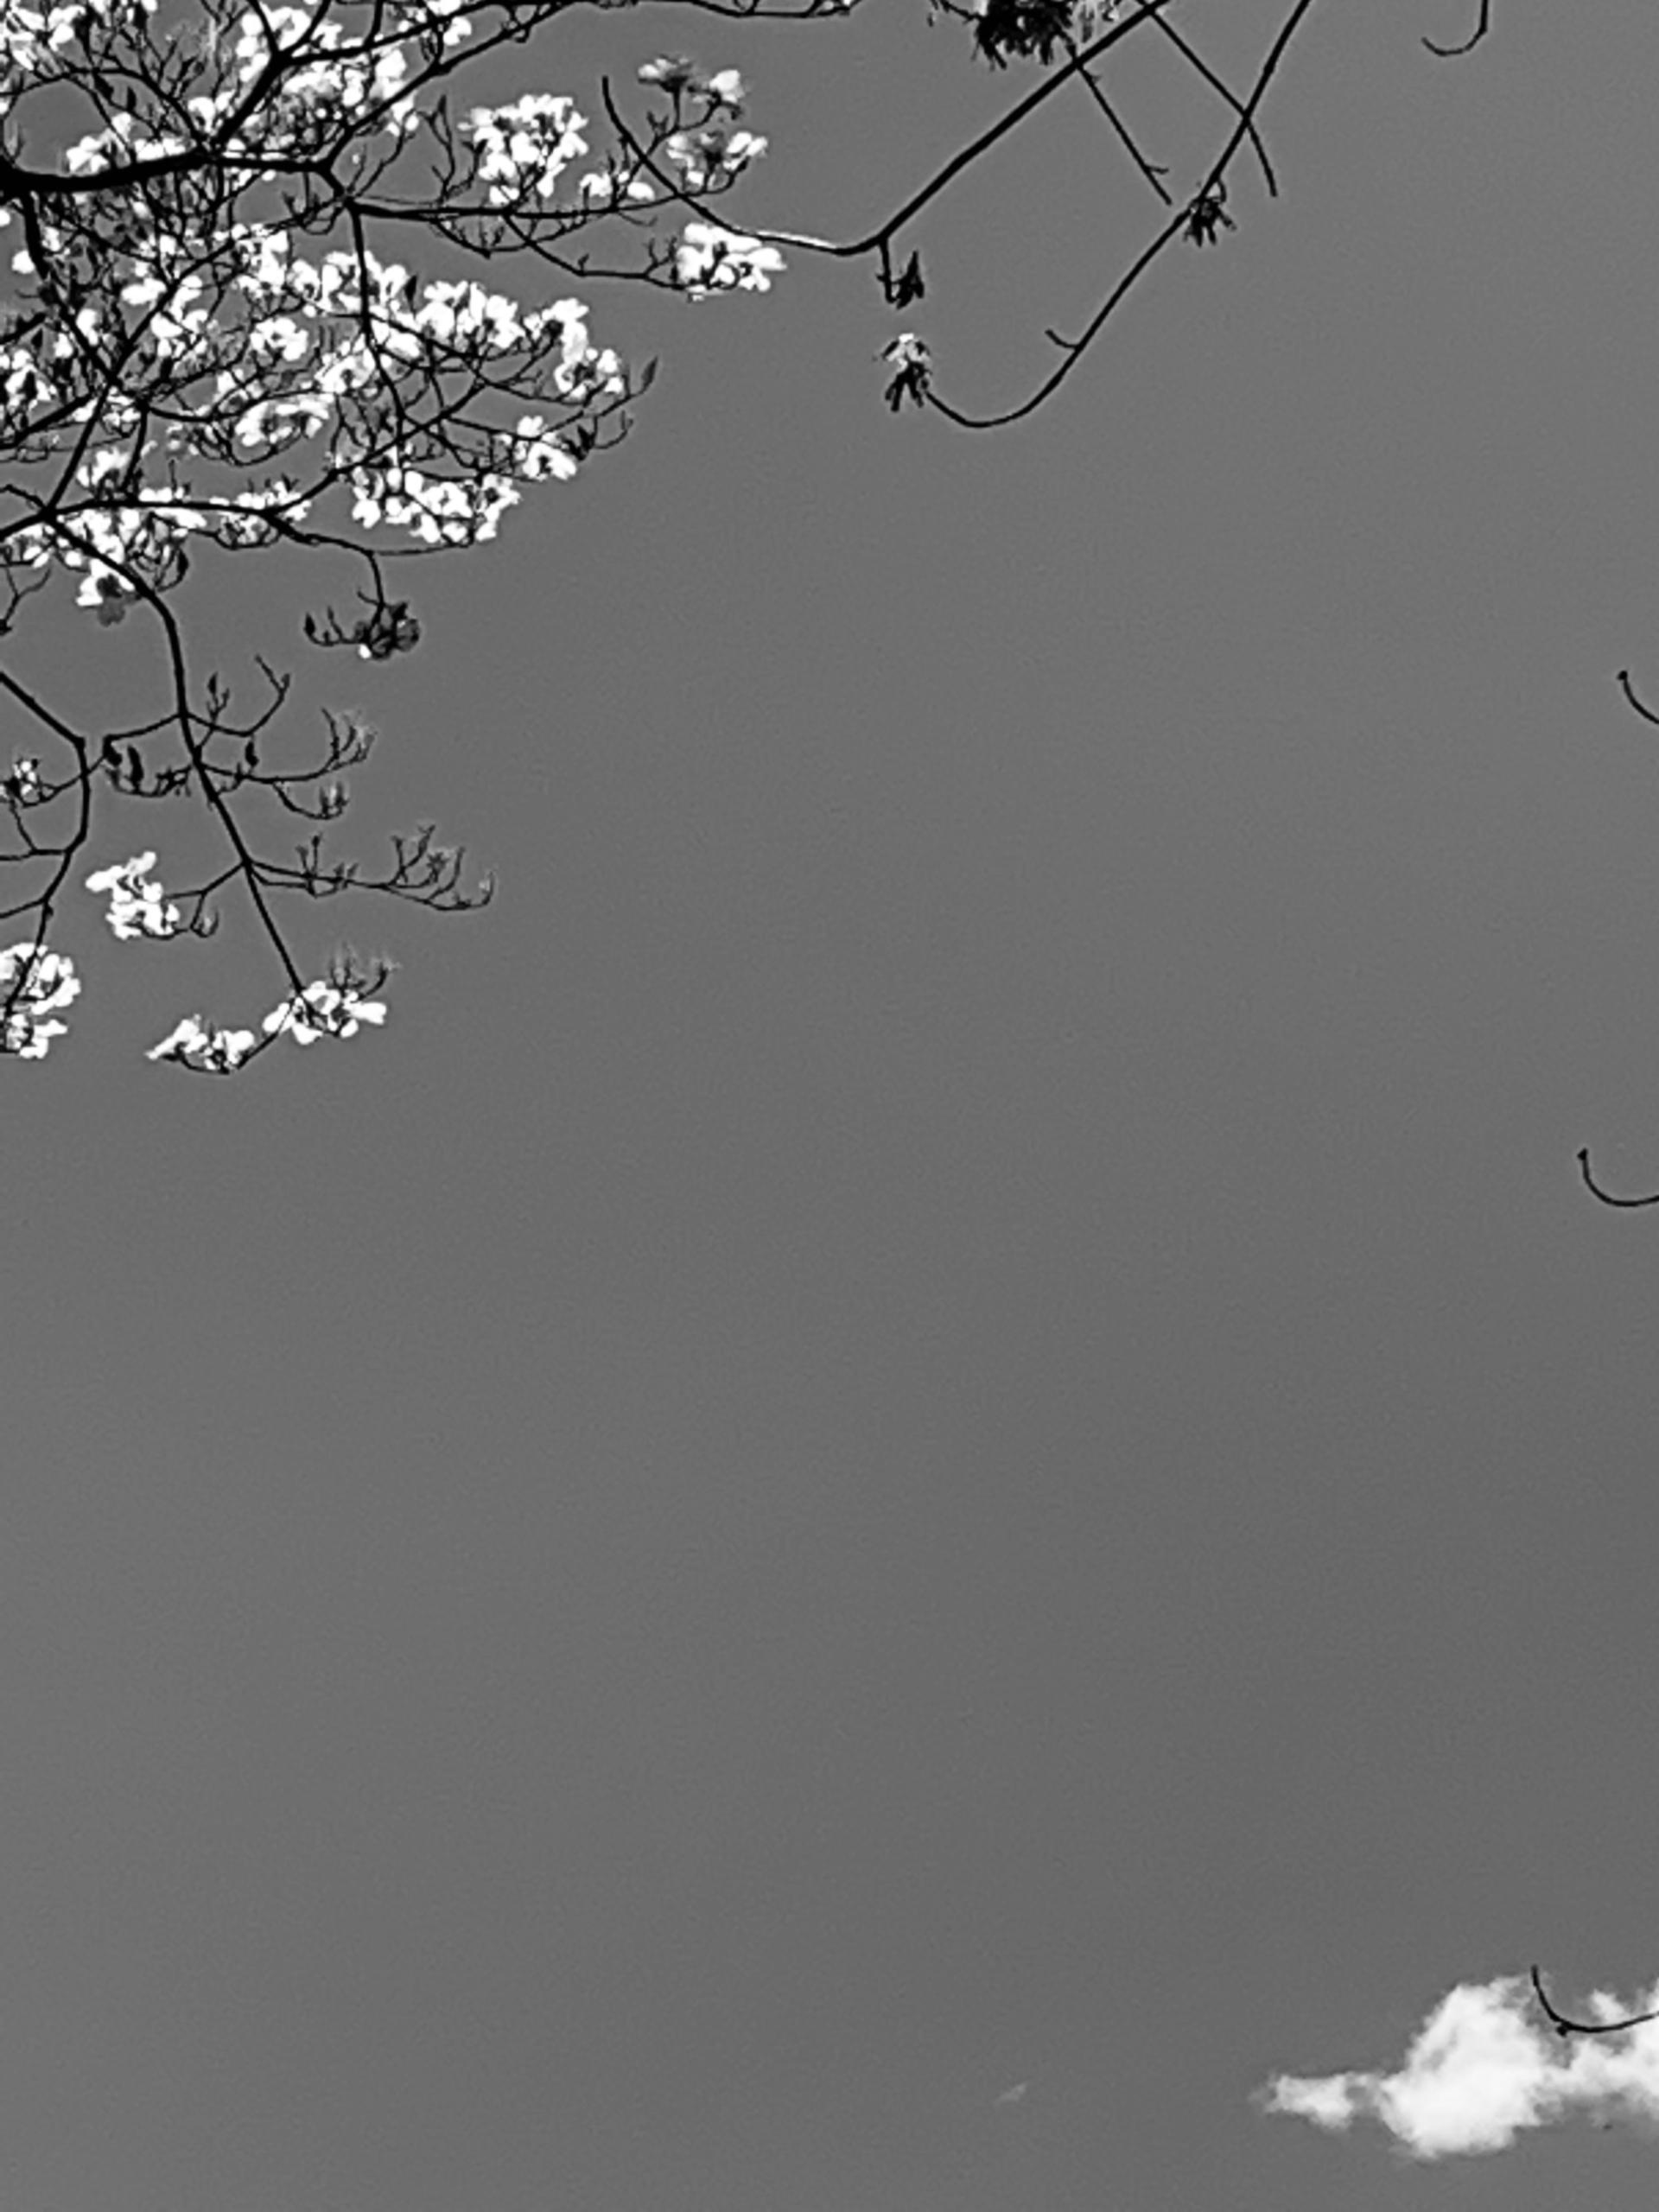 zebbro Post 13 May 2021 15:37:34 UTC   ello